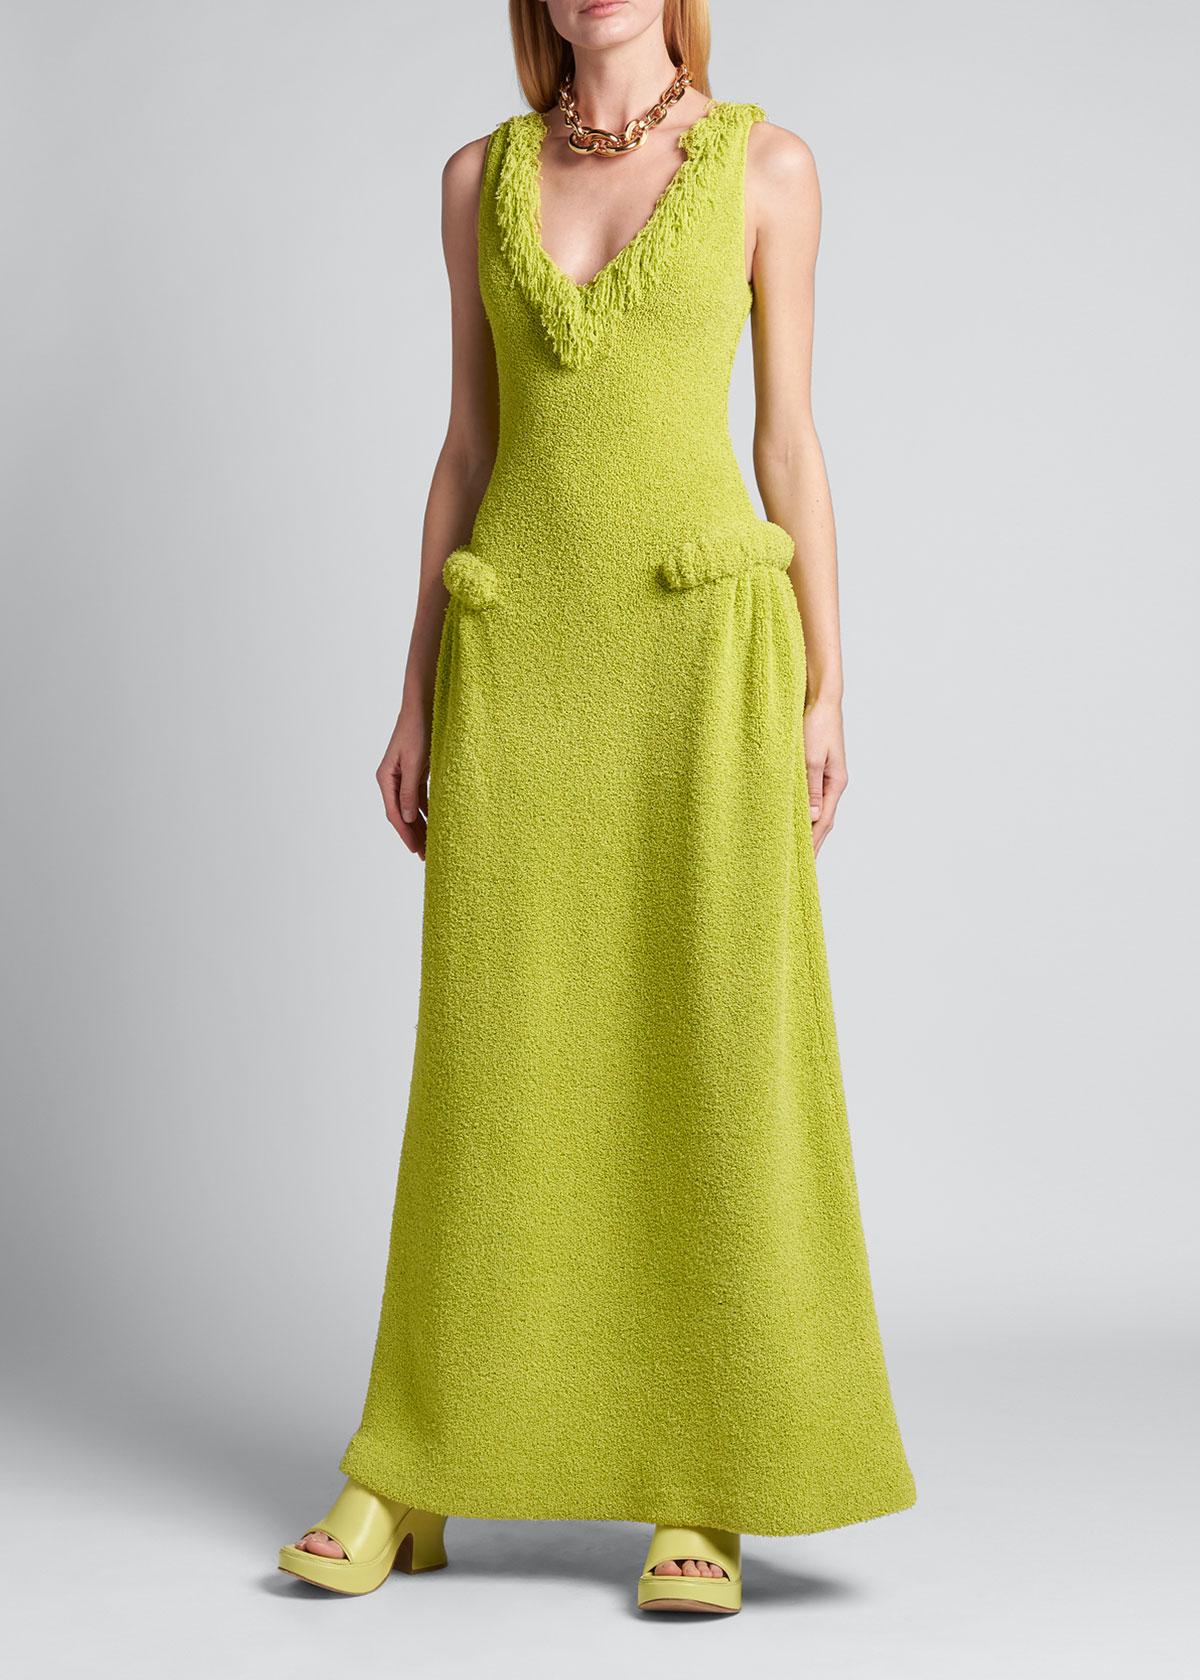 Bottega Veneta Gowns TOWELLING KNIT FRINGE A-LINE GOWN